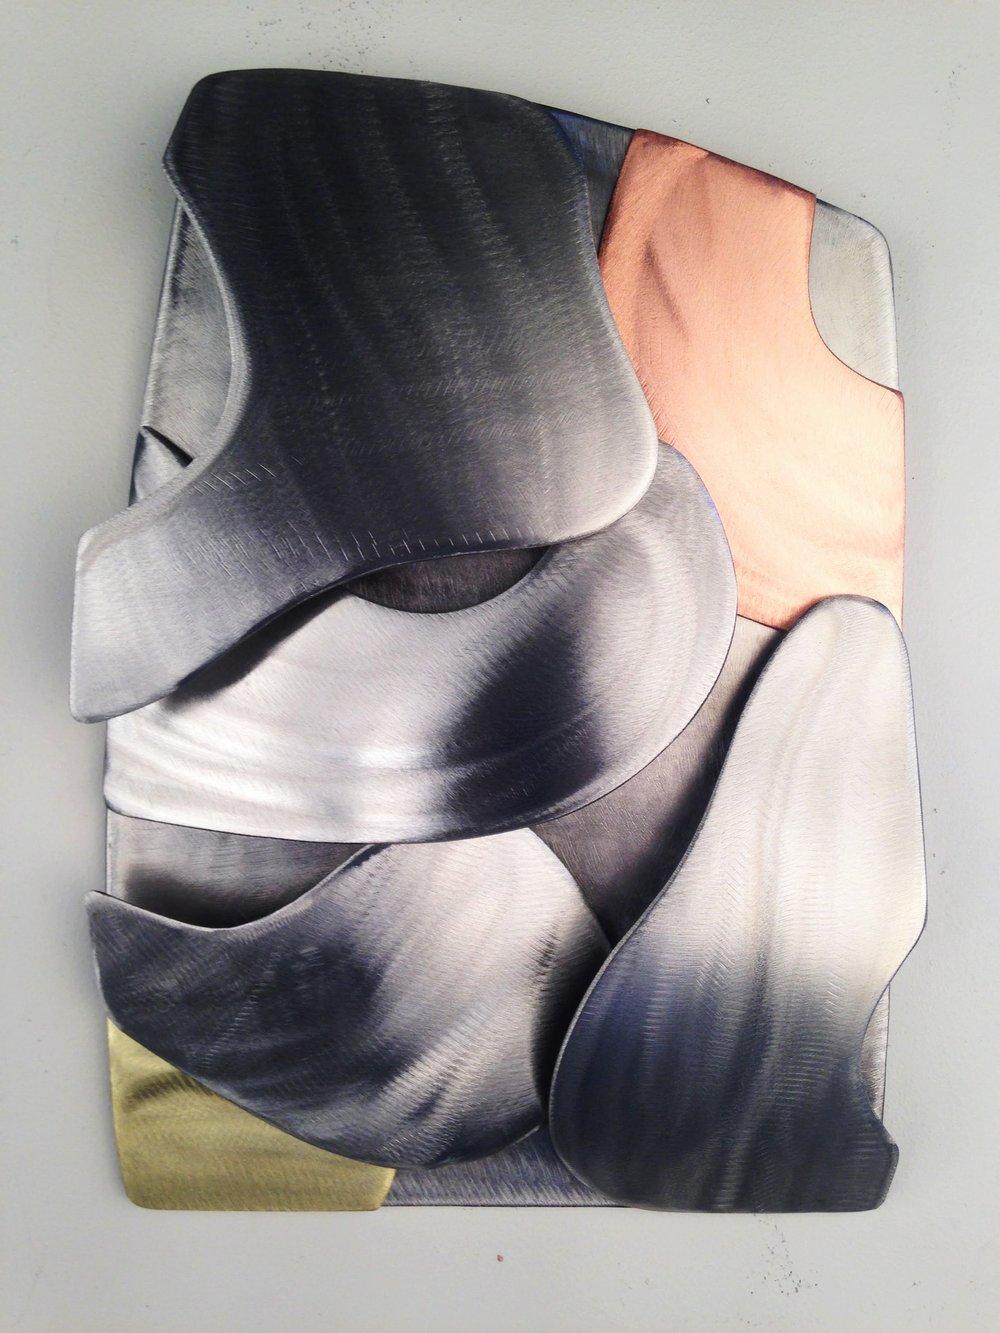 Contorno III (2018) - stainless steel, copper, brass - 34 x 24 cm.jpg